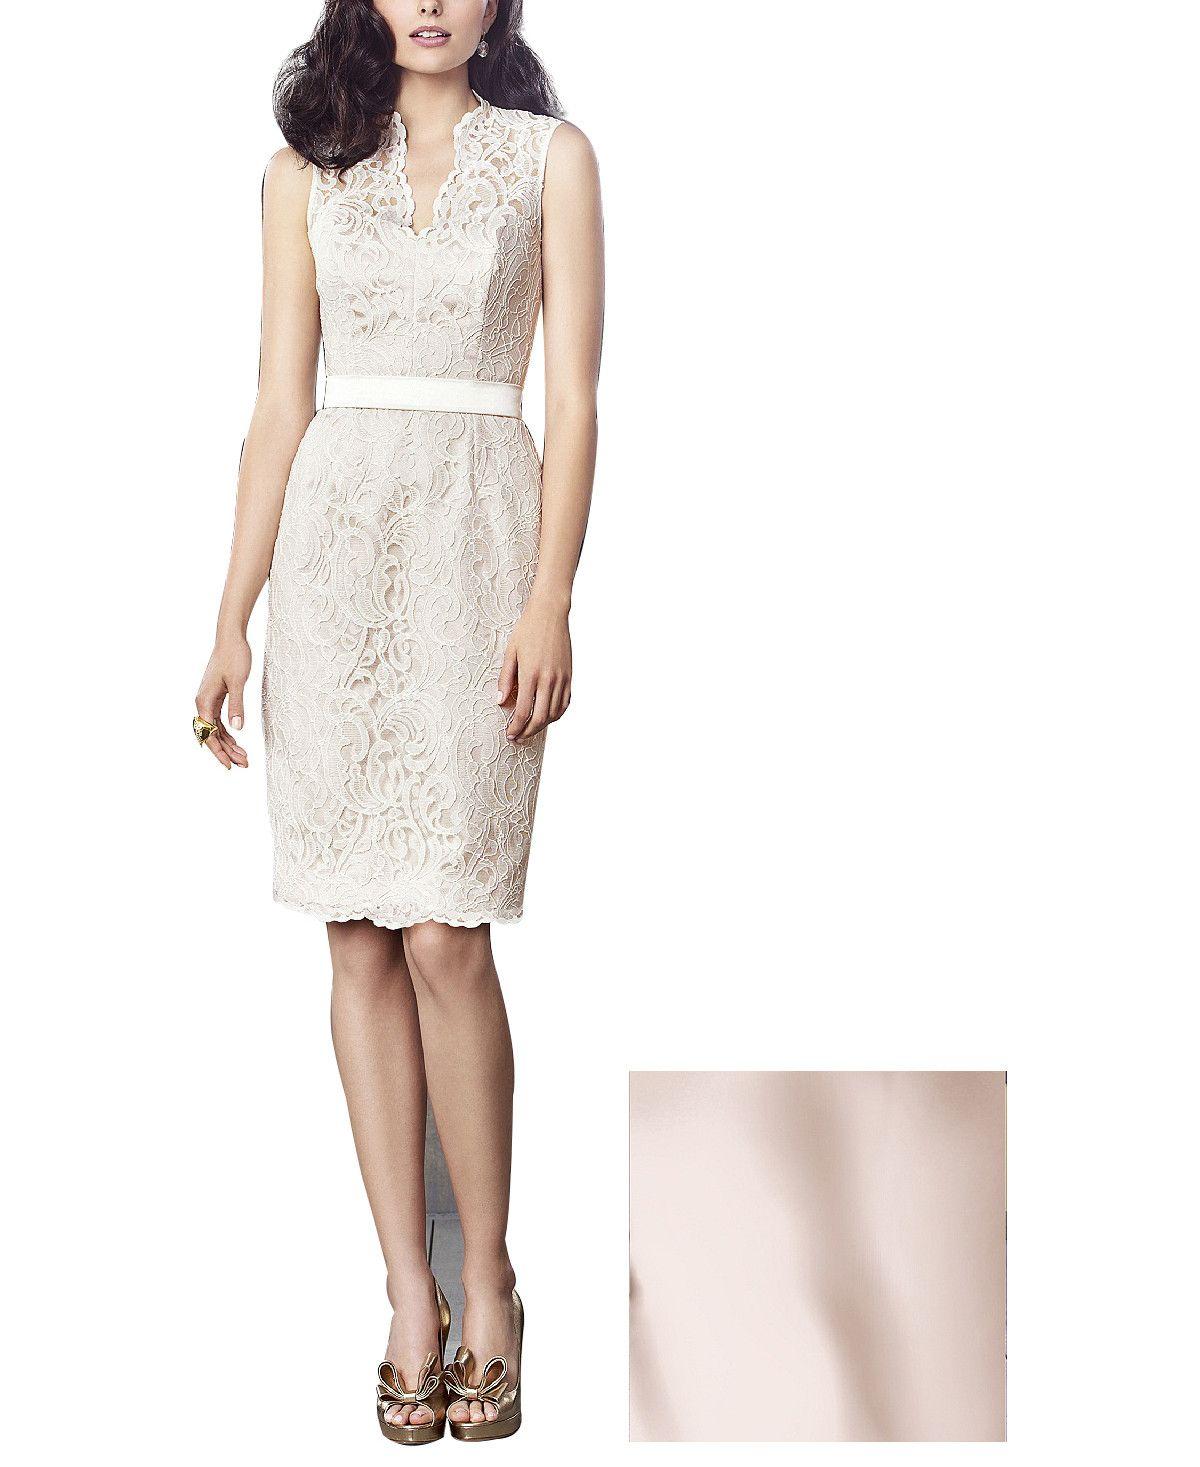 DescriptionDessy Collection Style2912Cocktaillength bridesmaid dressSleevelessV-neckline1.5